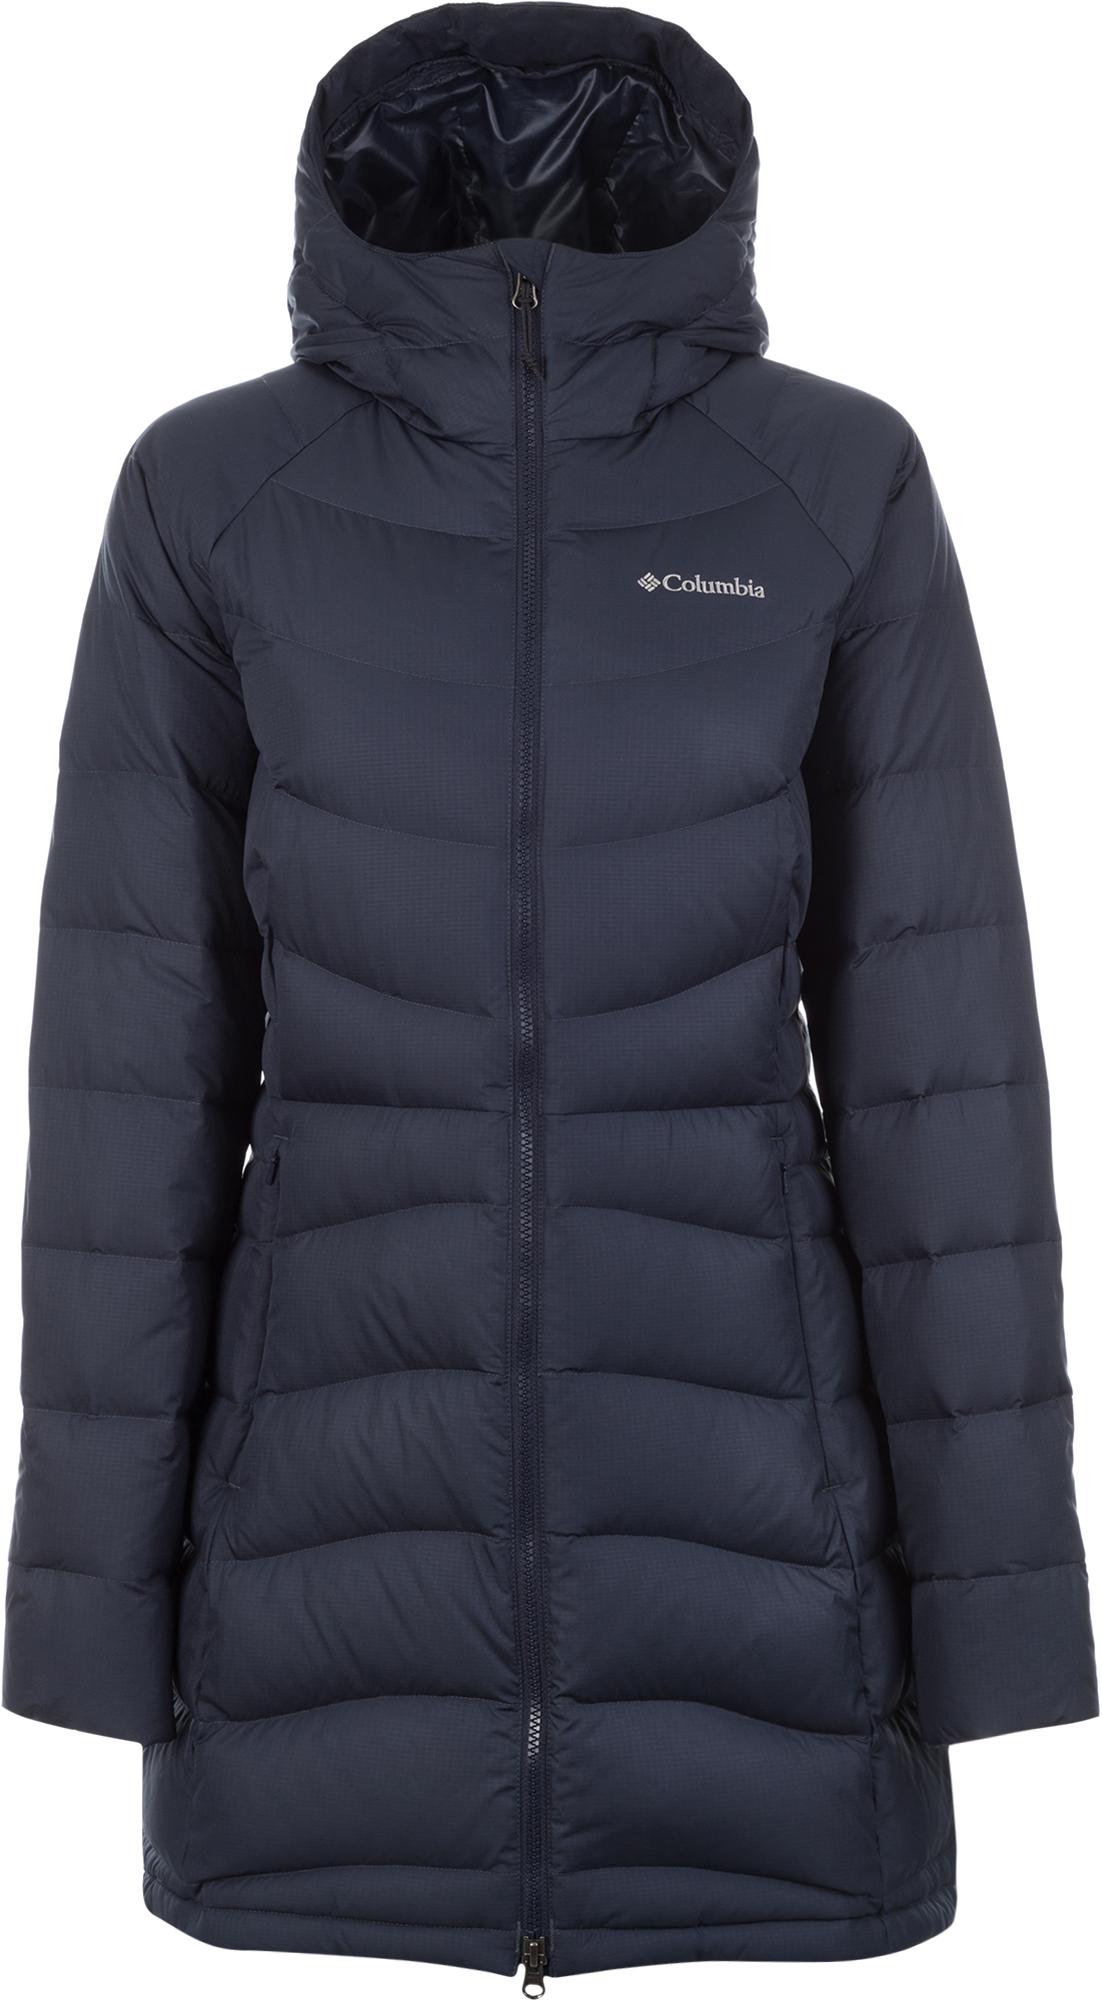 Columbia Куртка пуховая женская Columbia Winter Haven, размер 46 цена